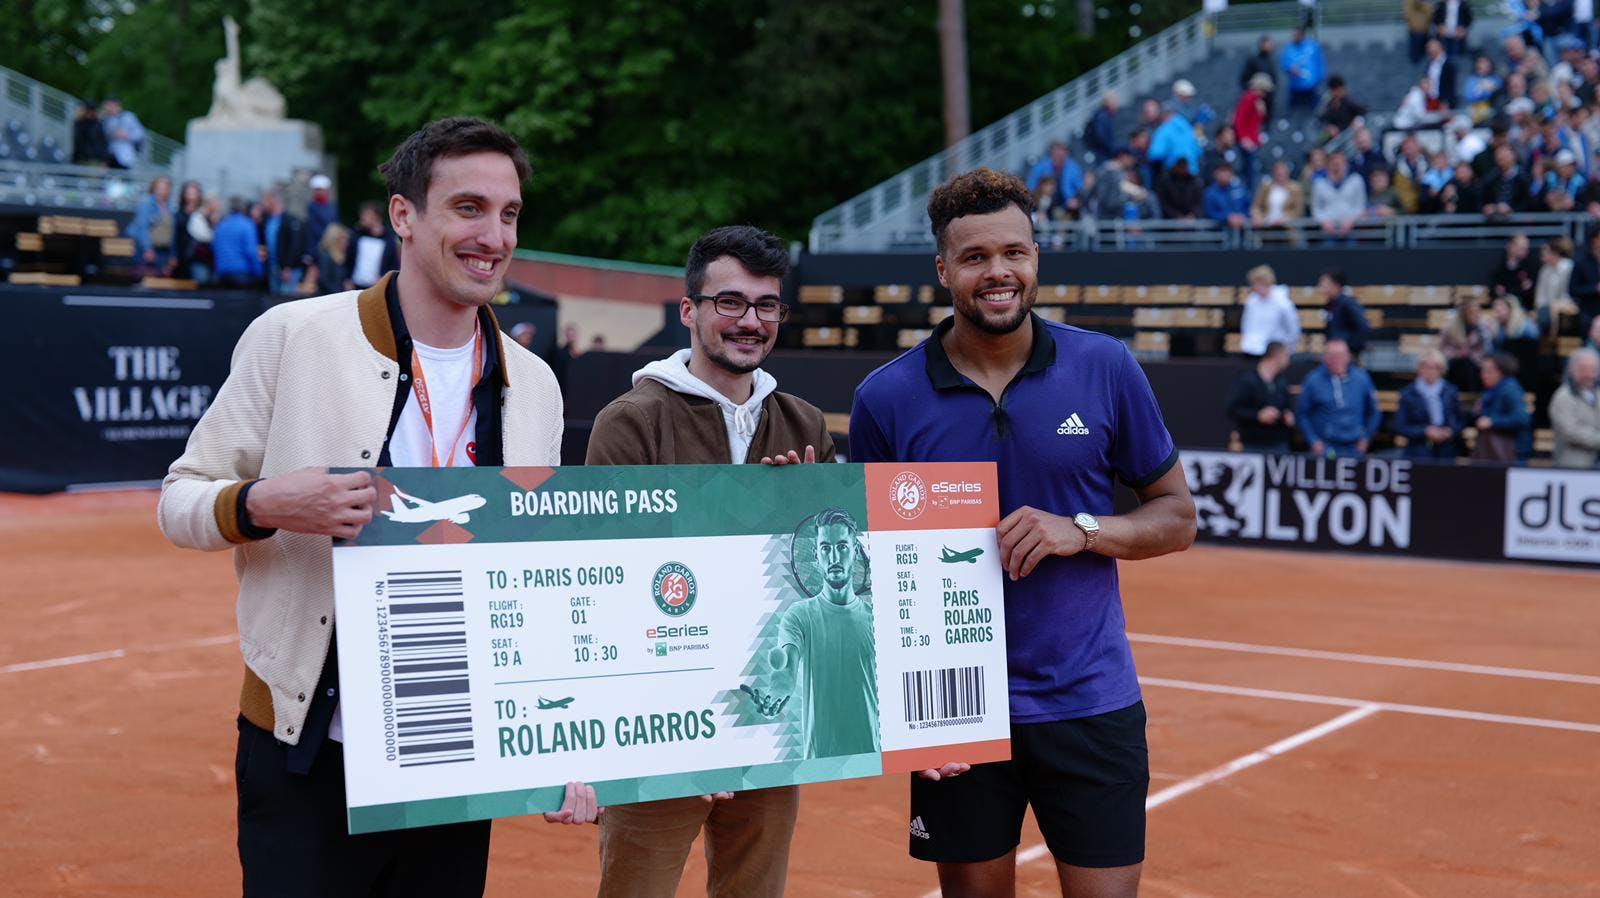 Roland-Garros eSeries by BNP Paribas - Thibaut Karmaly - Jo-Wilfried Tsonga - Norman Chatrier